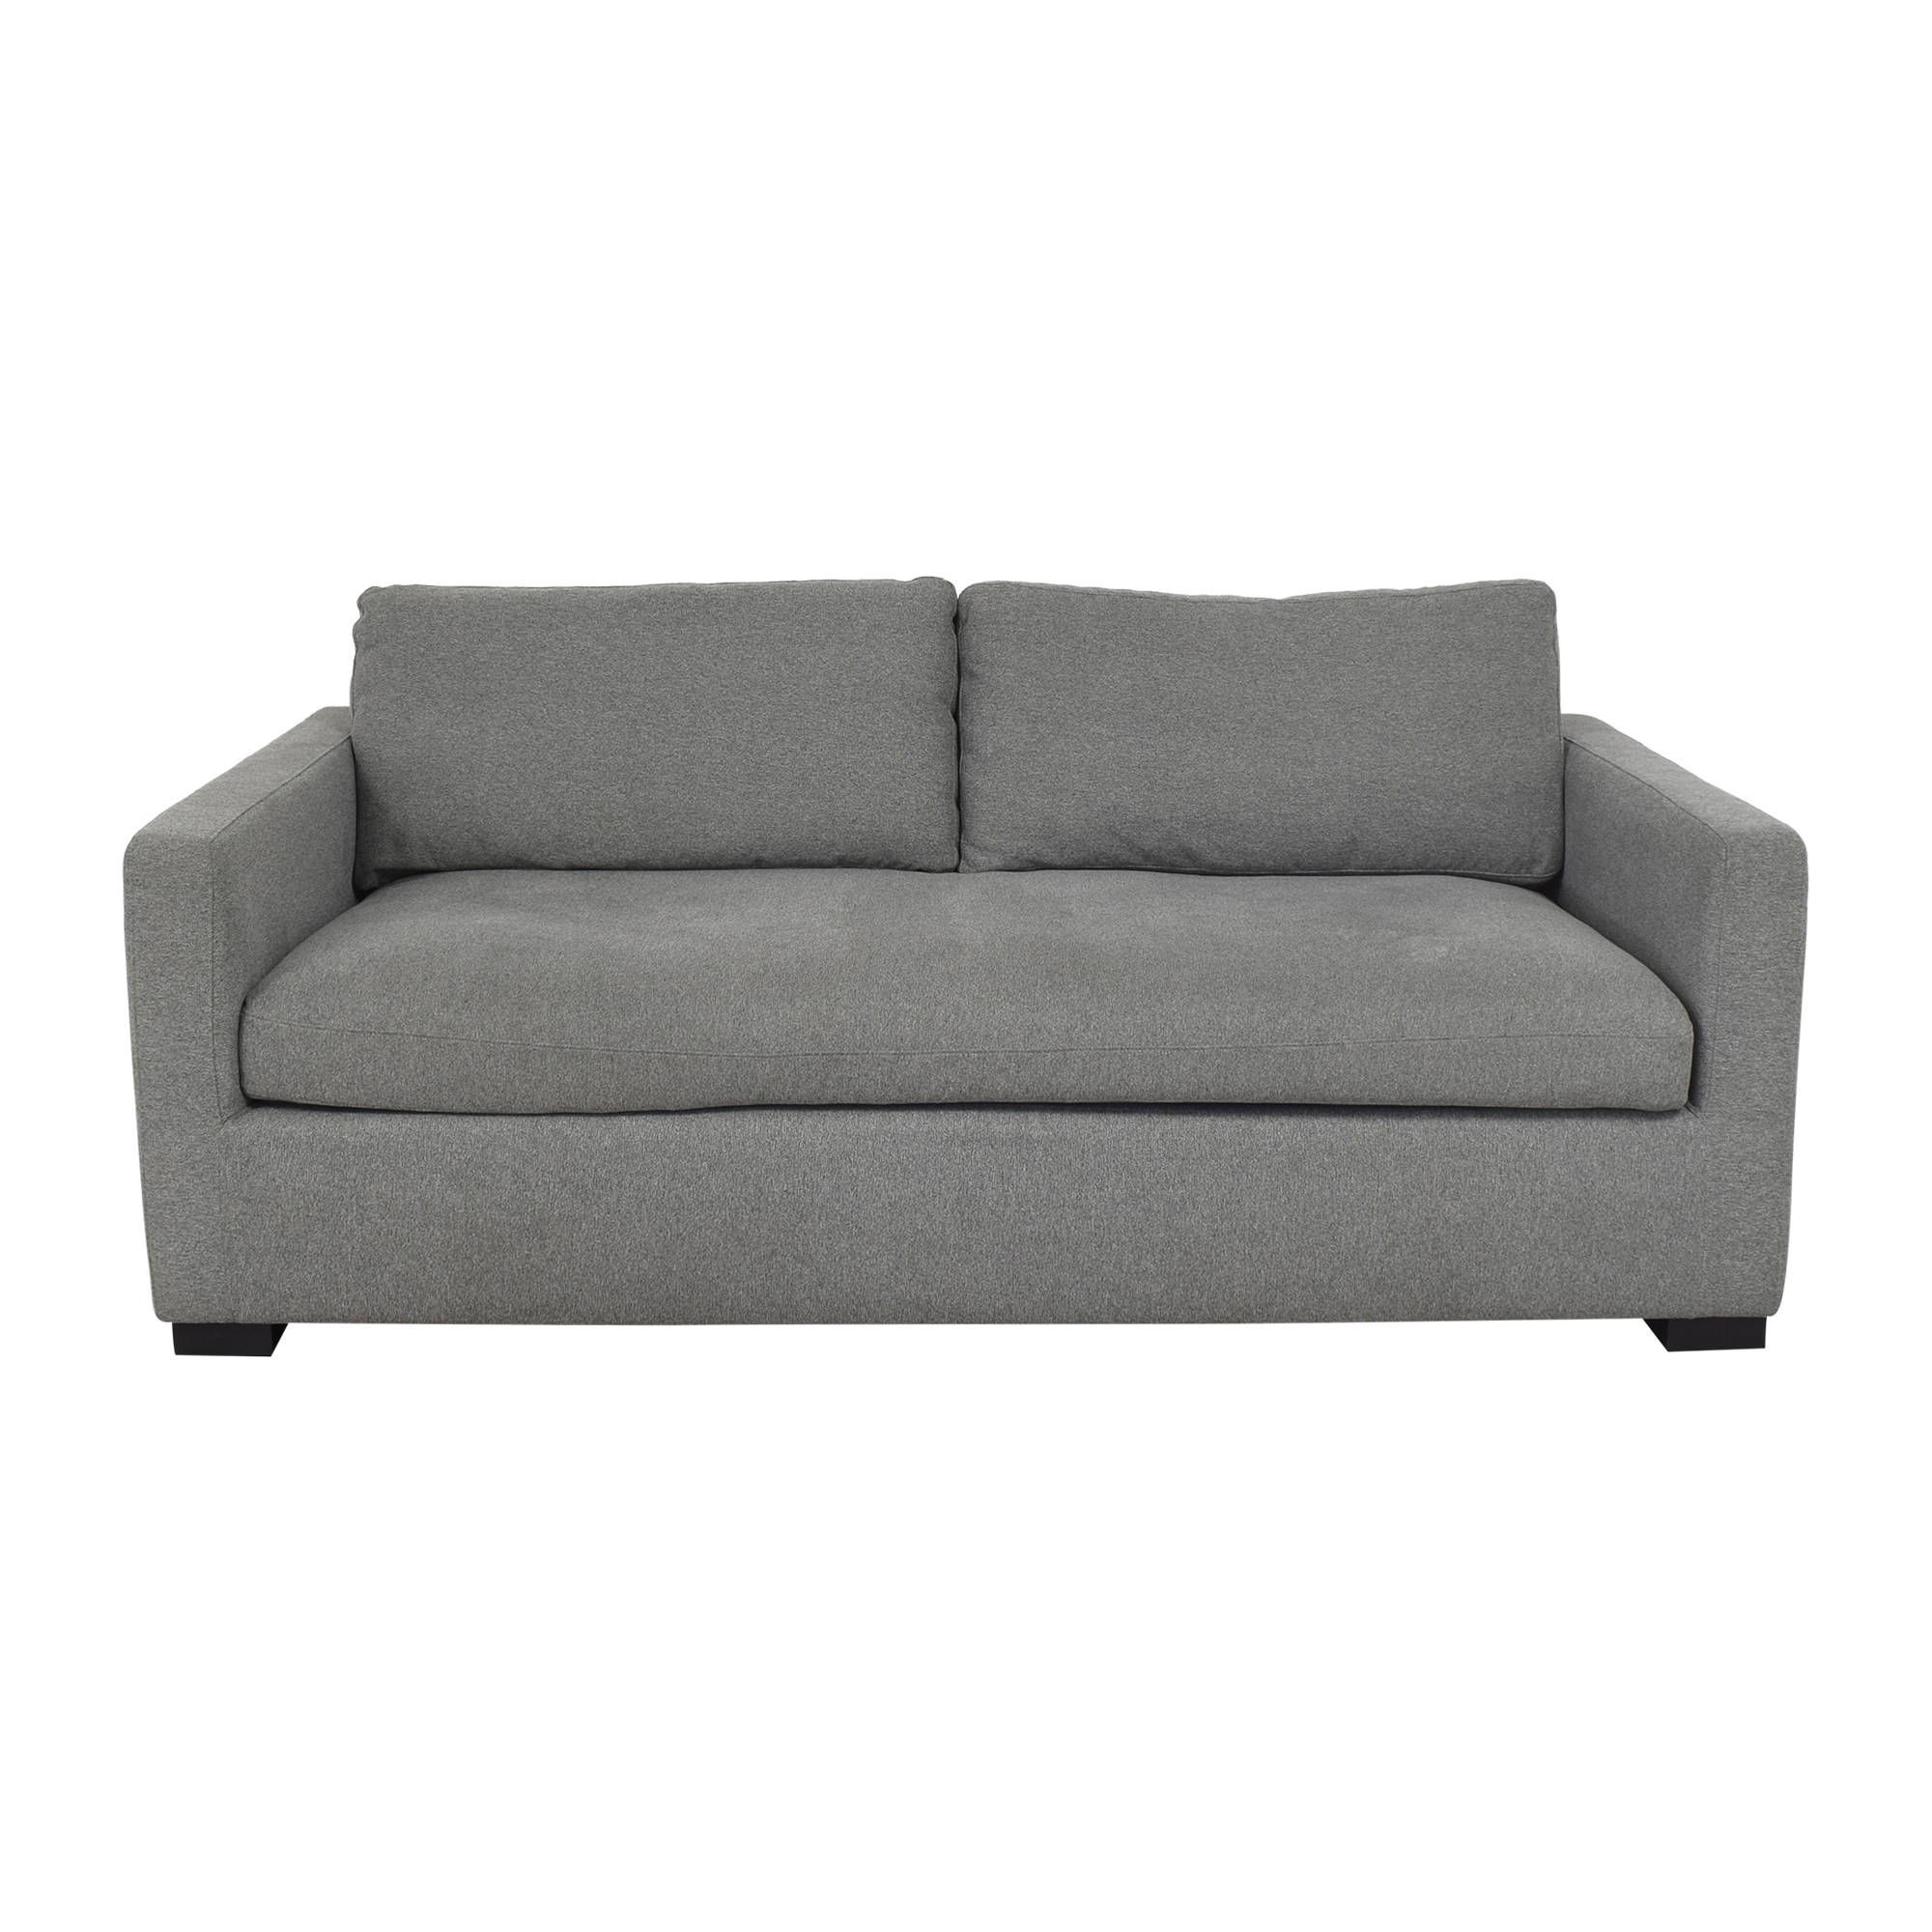 Interior Define Interior Define Charly Custom Sofa ma